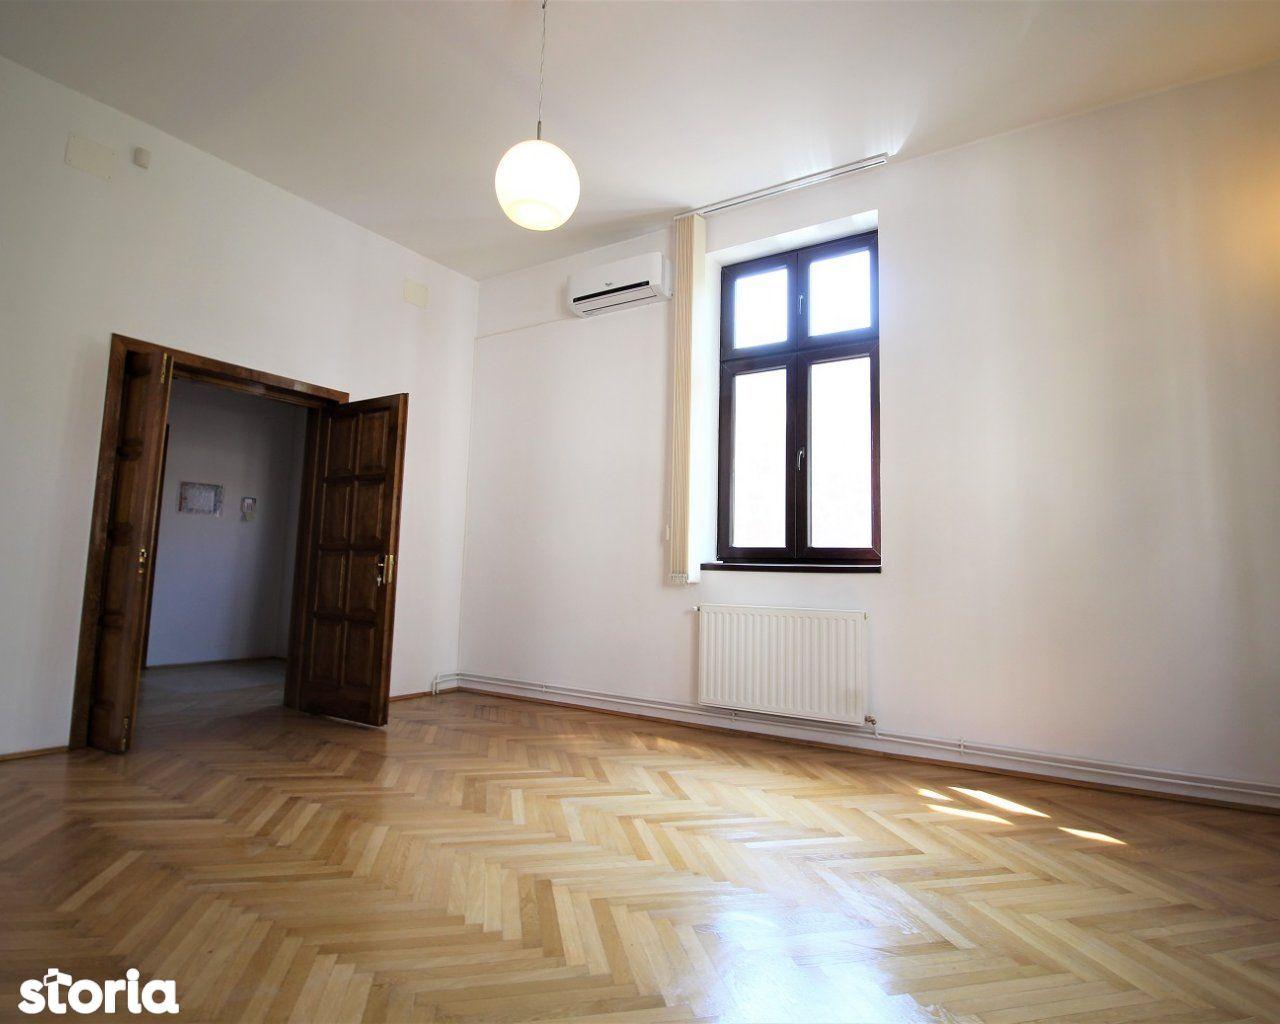 Casa de inchiriat, București (judet), Piața Pache Protopopescu - Foto 5